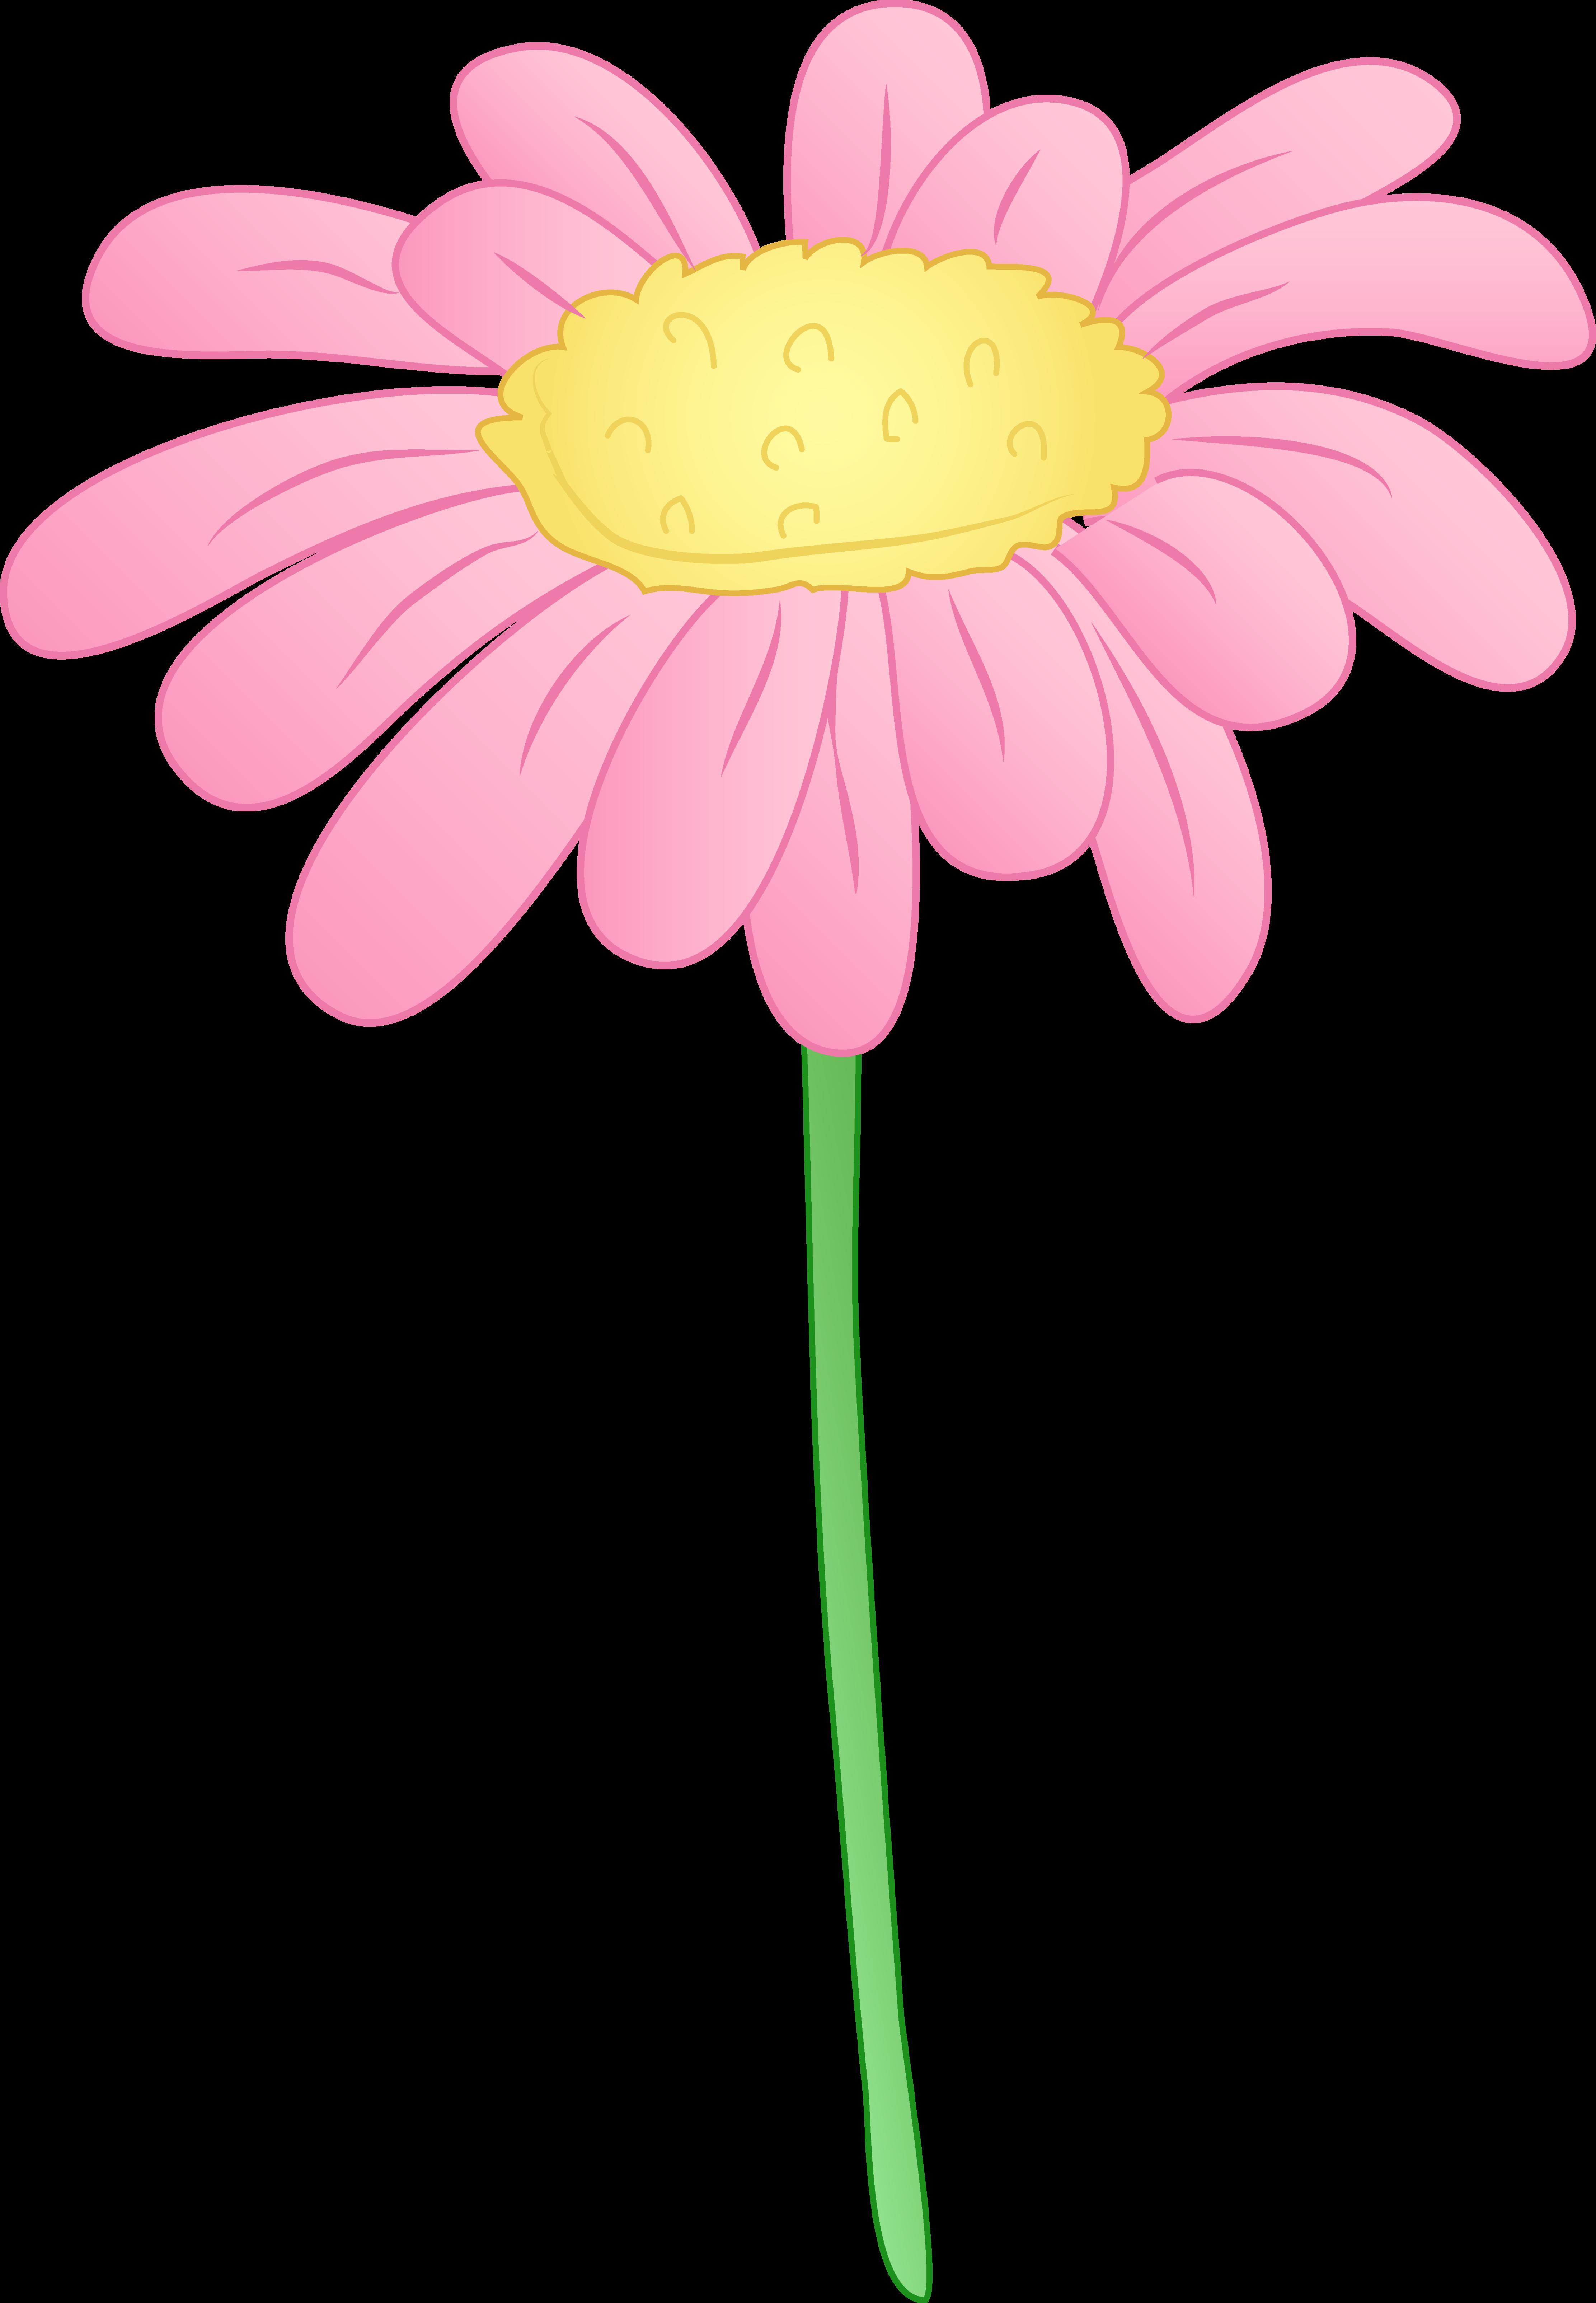 Daisy clipart daisie. Colorful clip art library